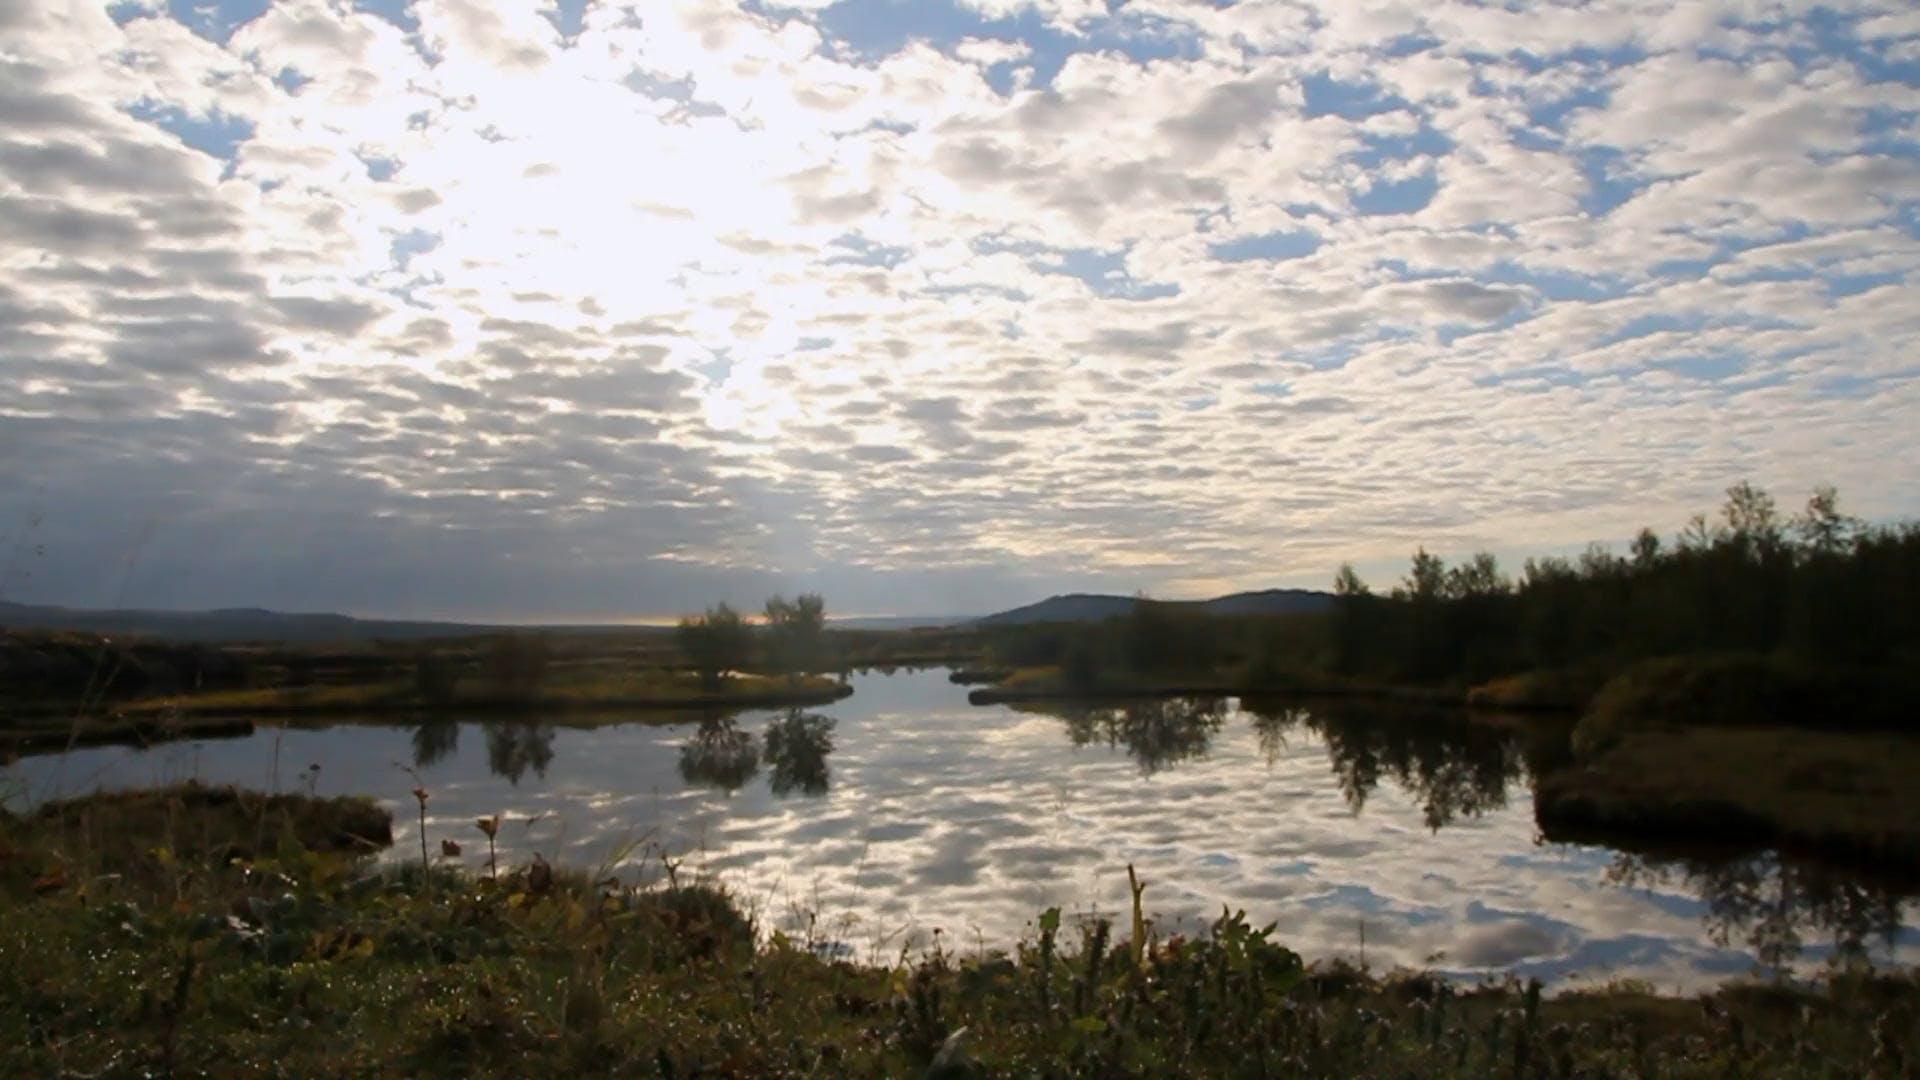 Video Of Calm River